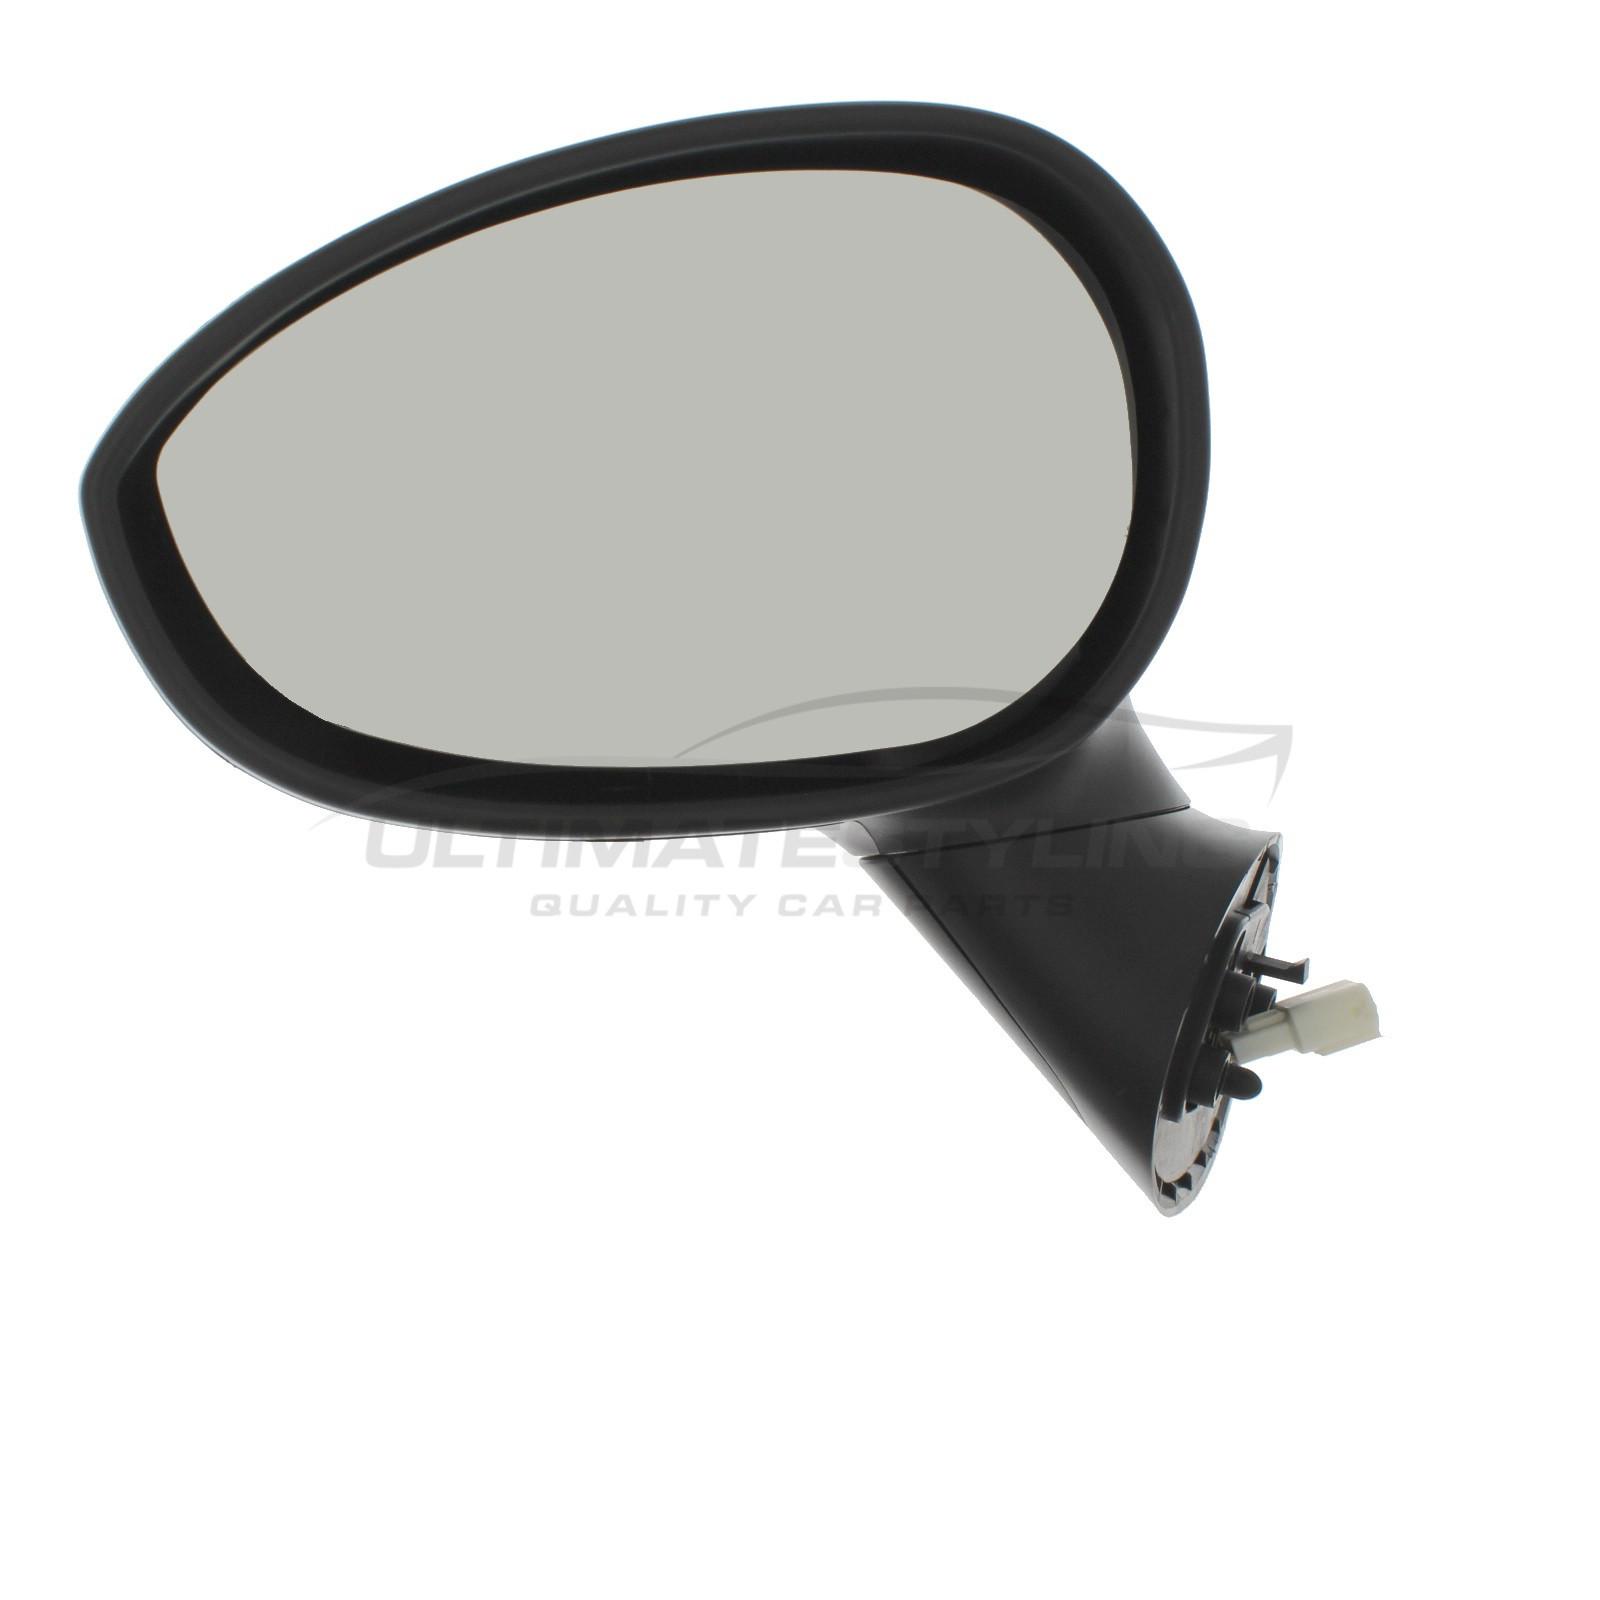 Fiat 500 2008> / Abarth 500 / 595 & 695 2015> Wing Mirror / Door Mirror - Passenger Side (LH) - Electric adjustment - Heated Glass - Temperature Sensor - Primed